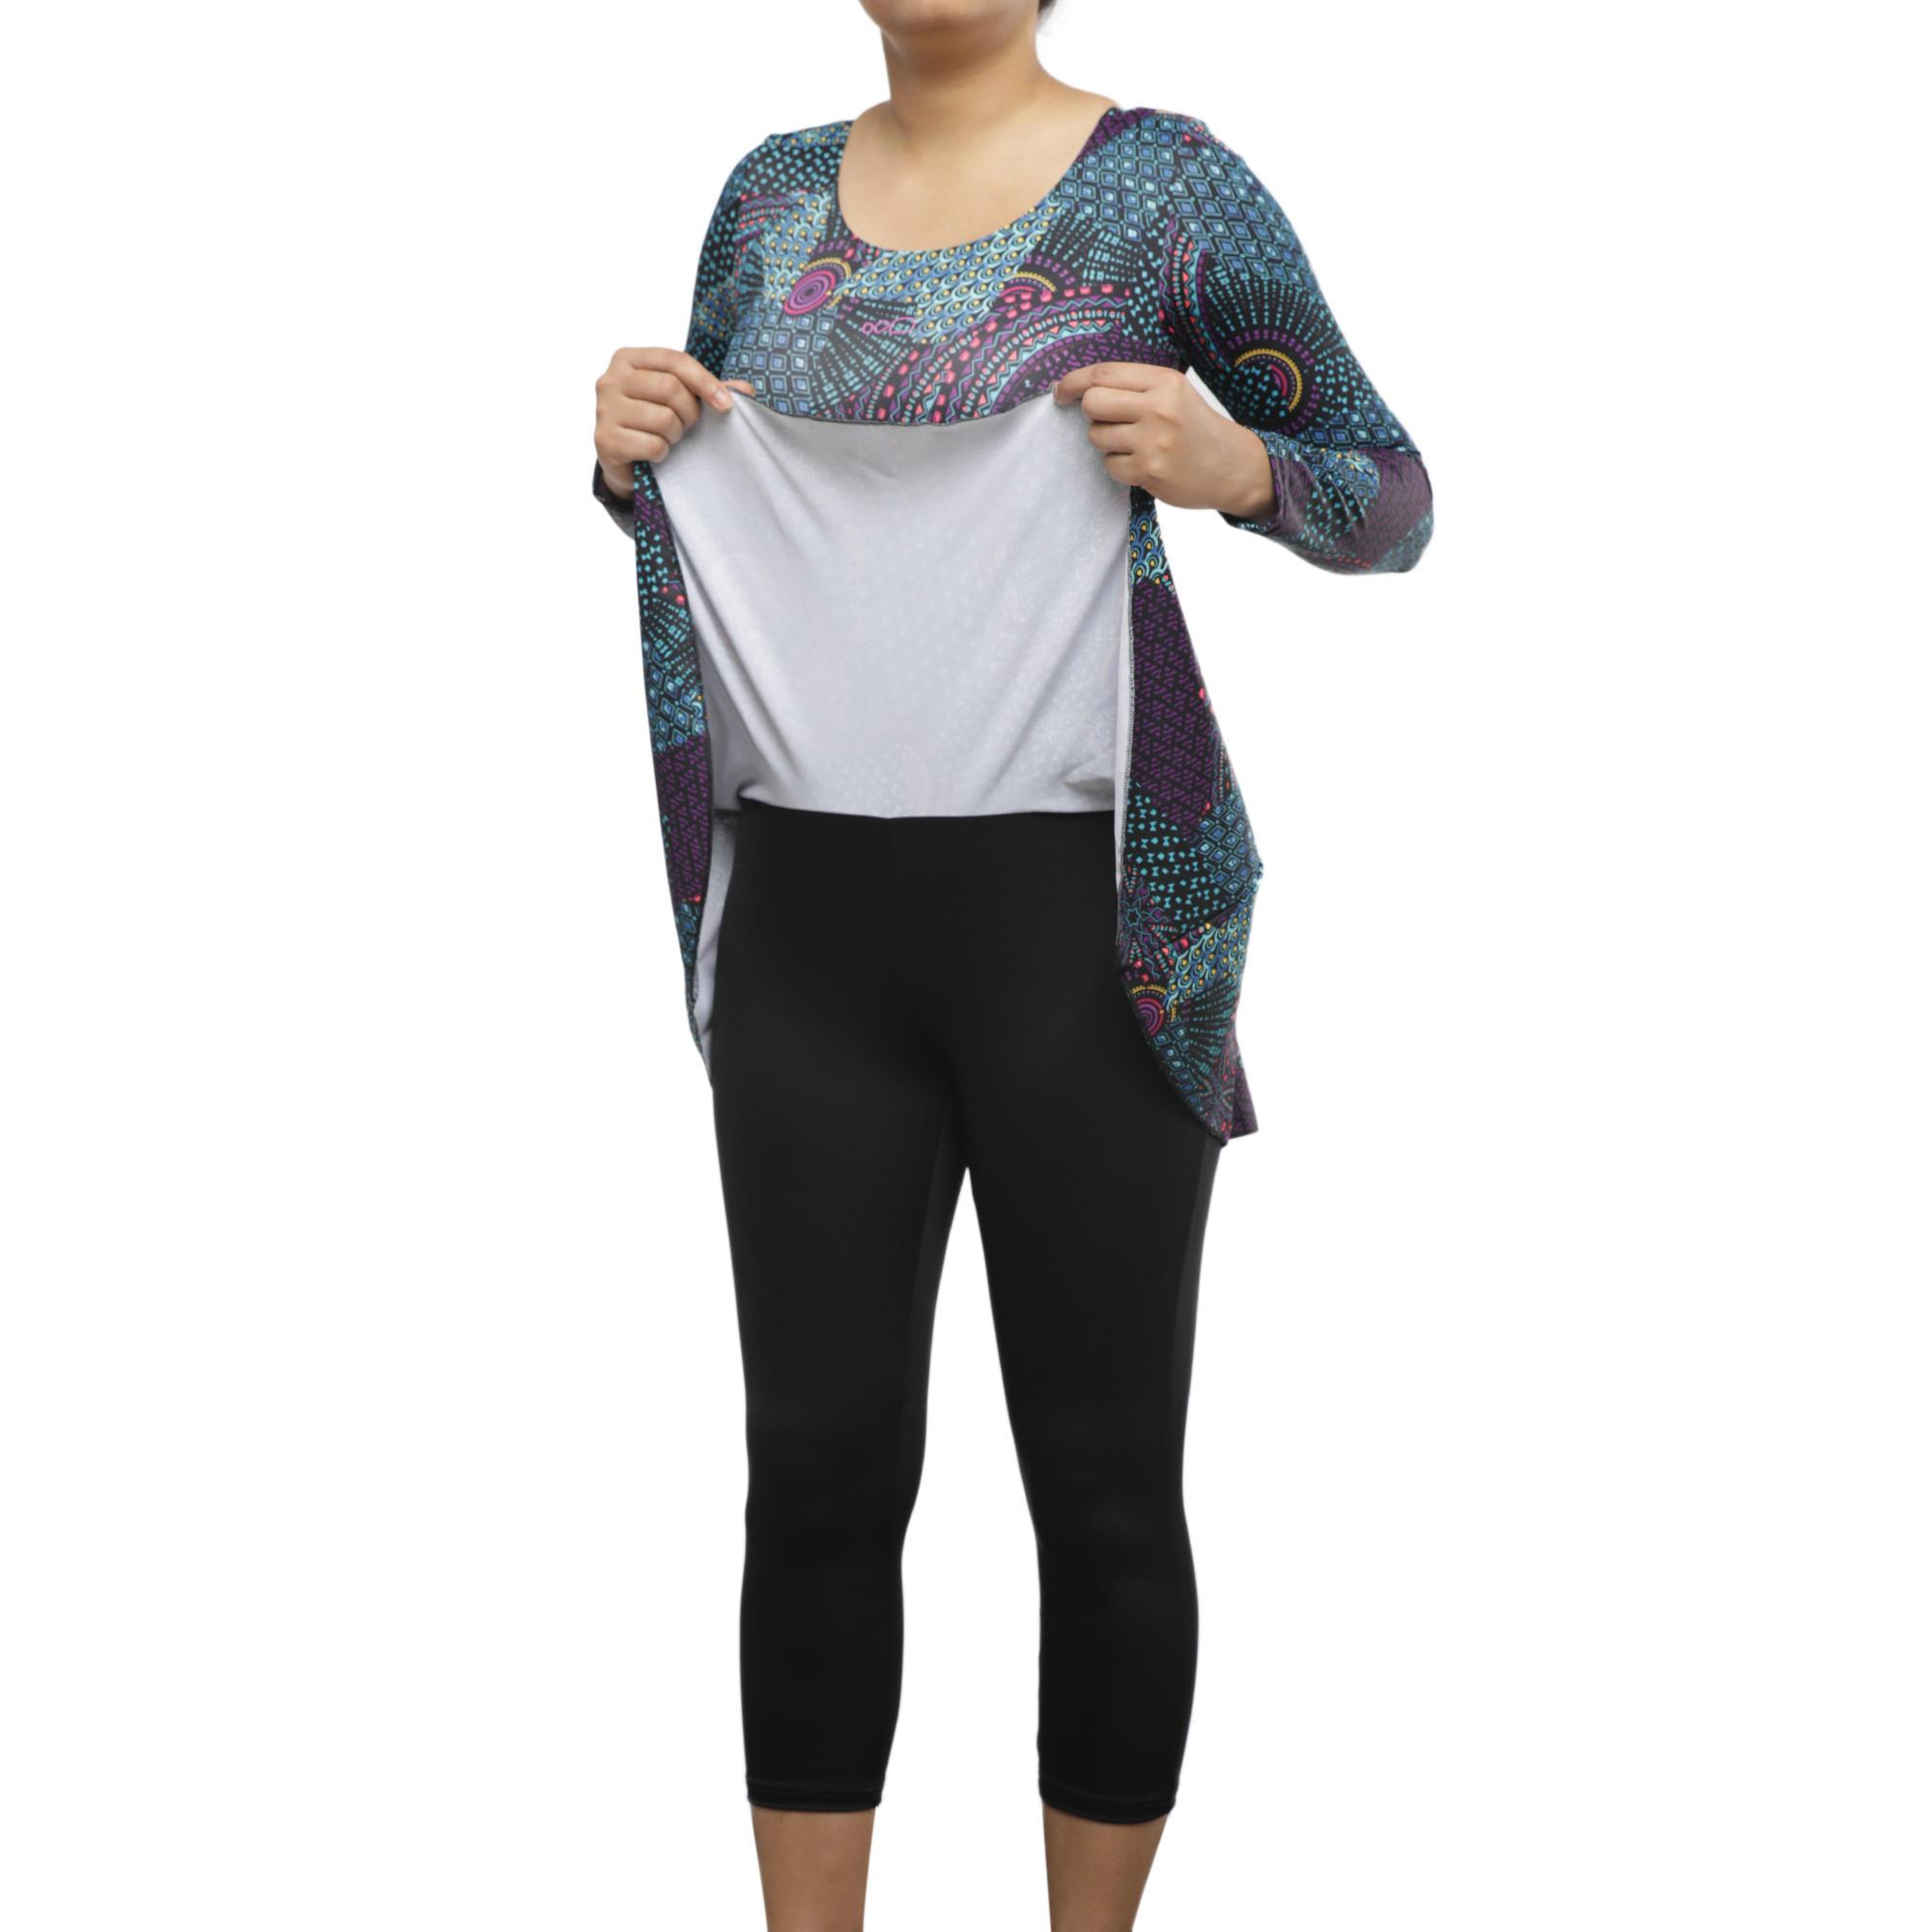 Women One Piece Athletic Comfort Swimming Costume Swimwear Size 8 10 12 14 16 18